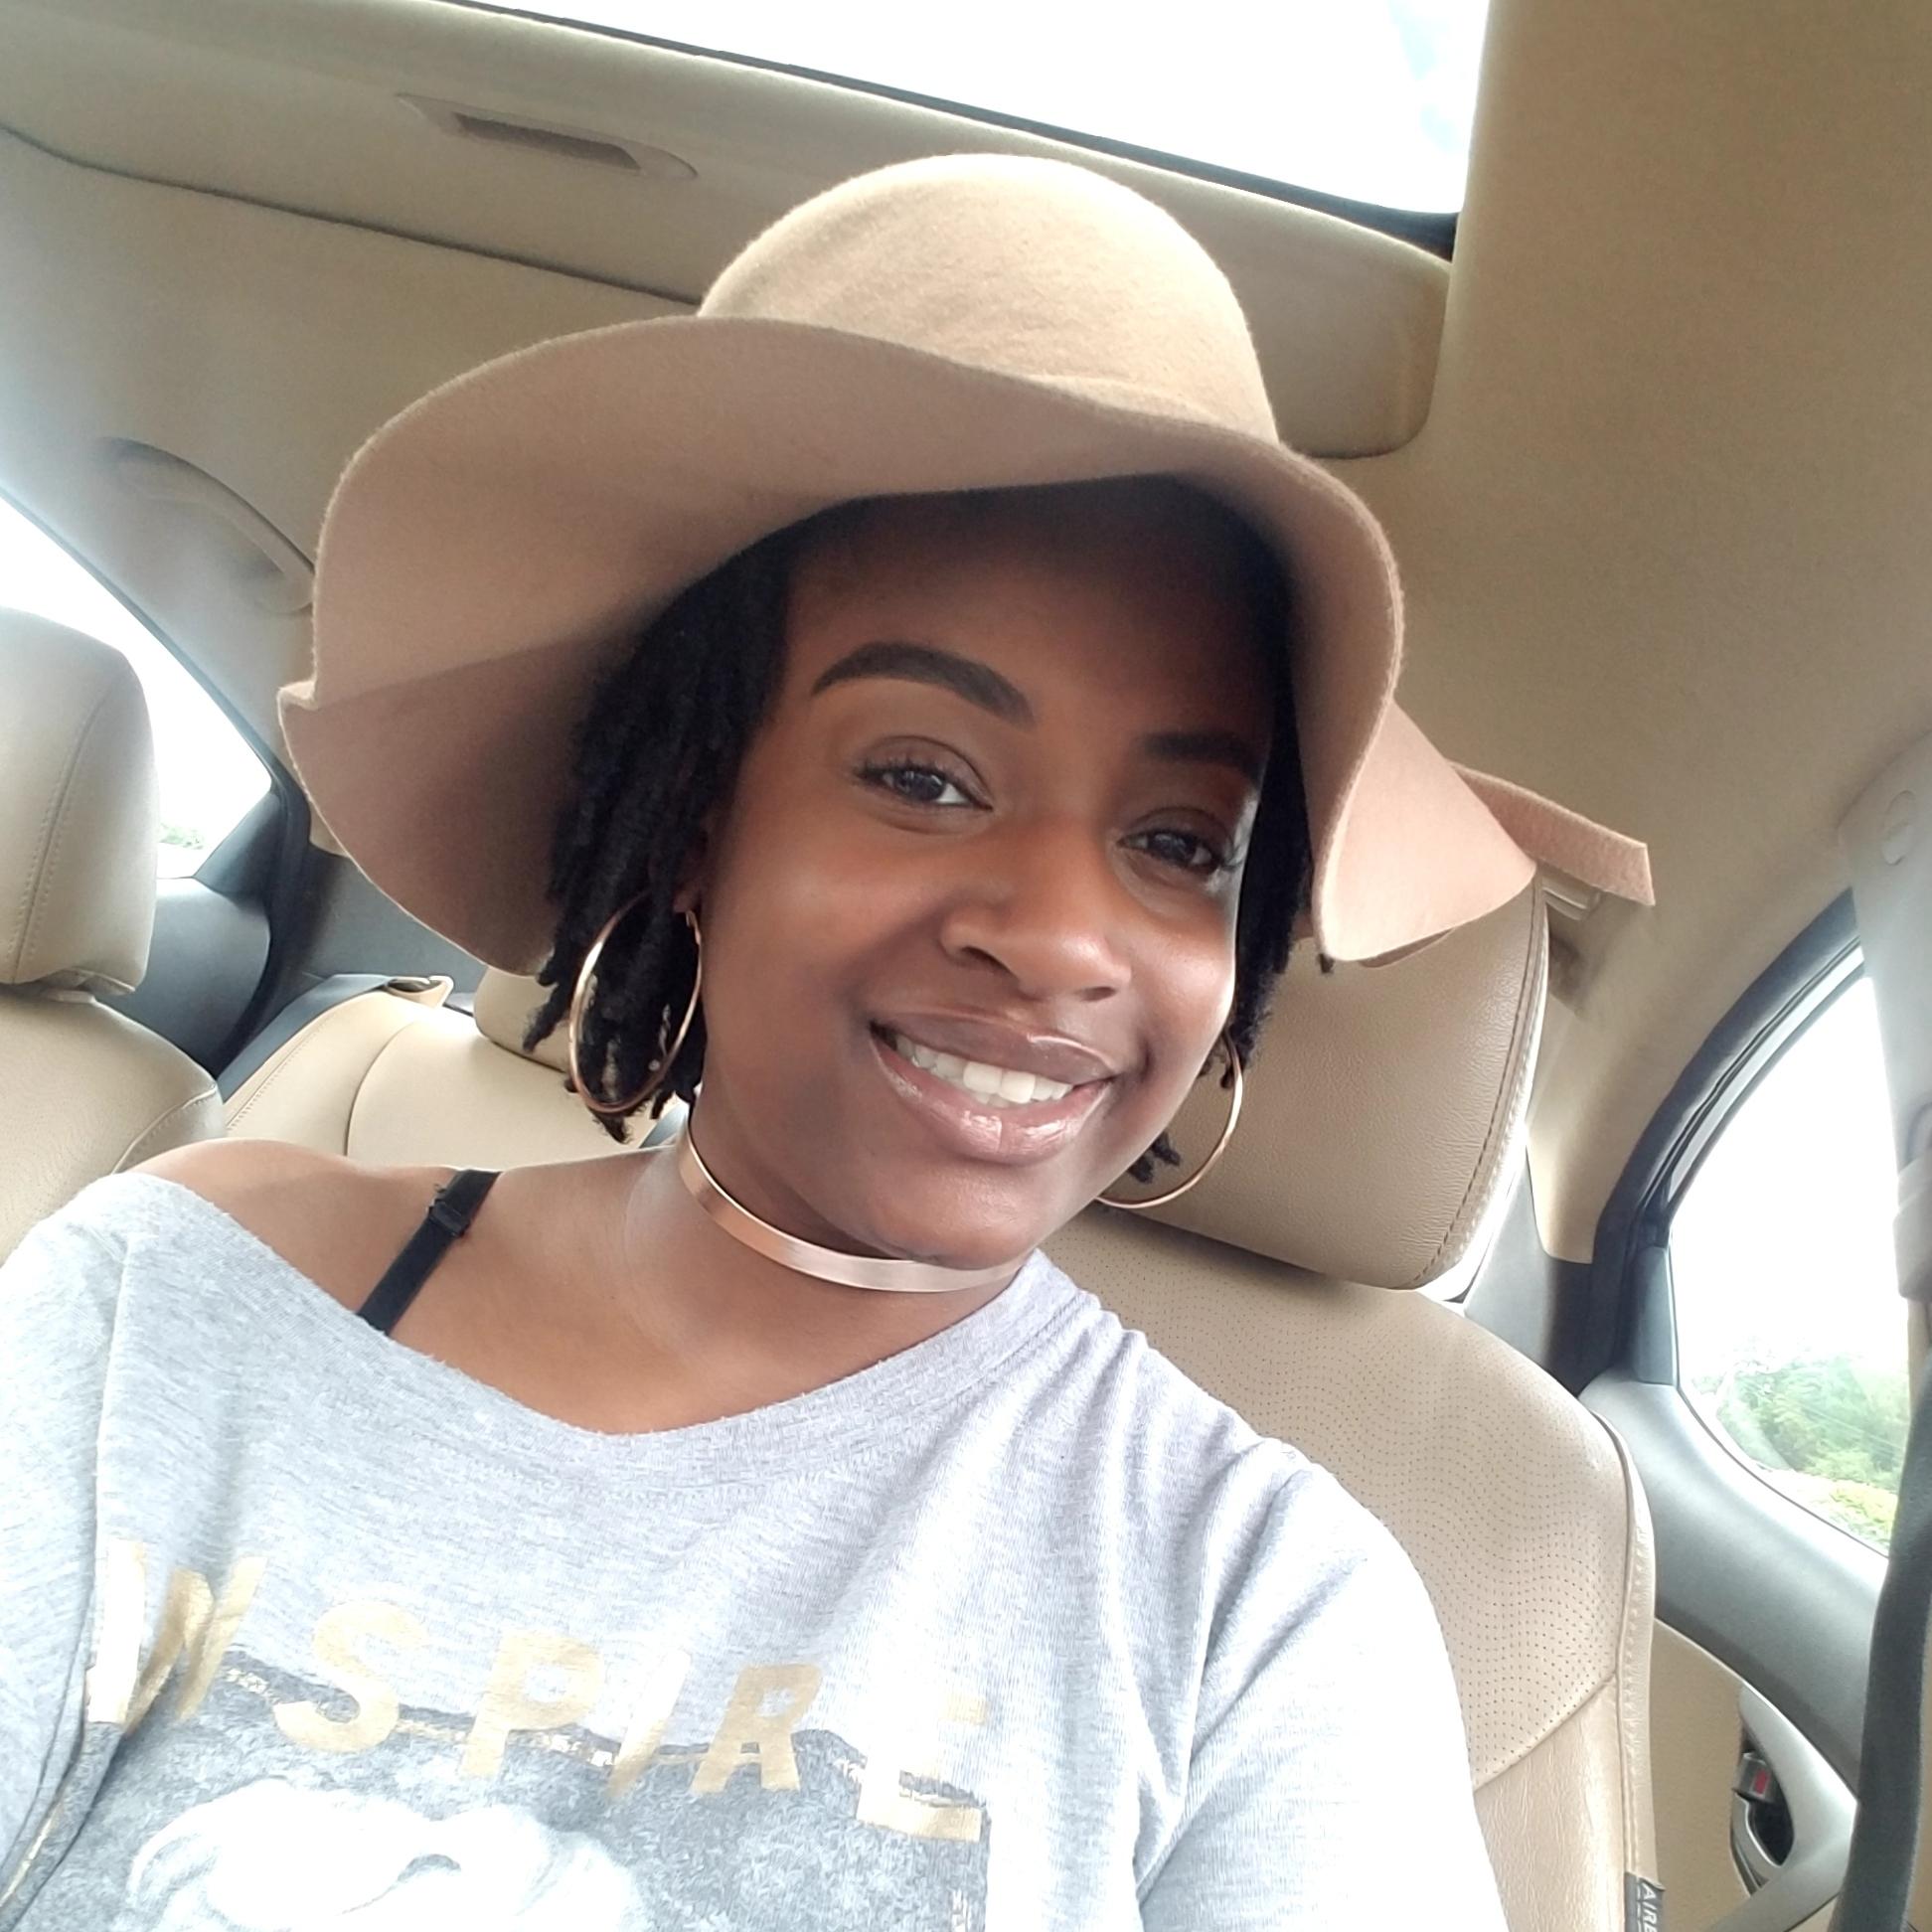 Meet Litisha, the teeth whitening dentist behind  Glow Smiles   Location: Atlanta, Georgia